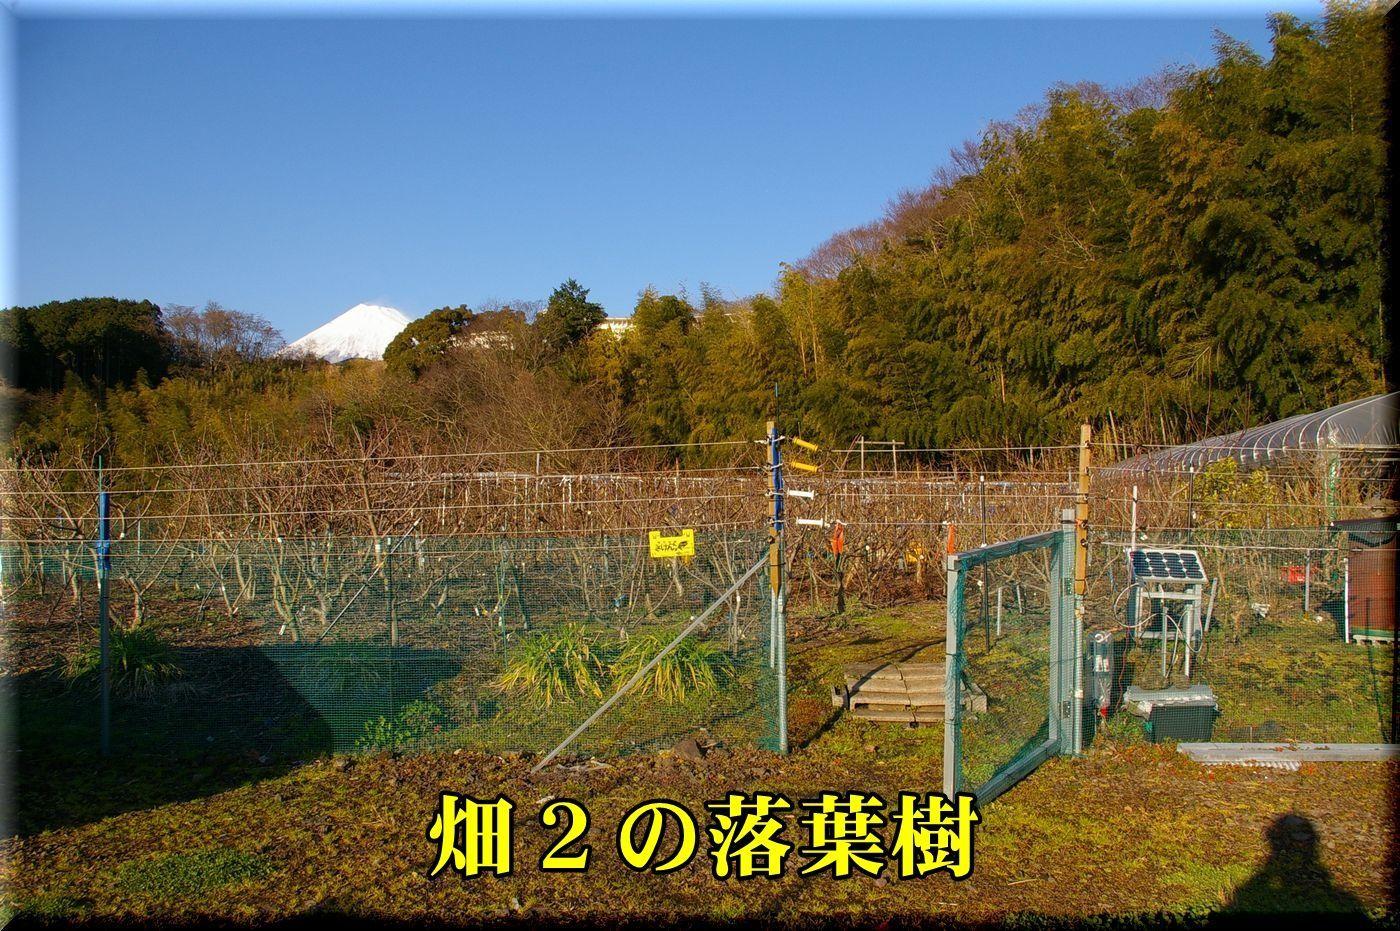 1hatake170110_007.jpg